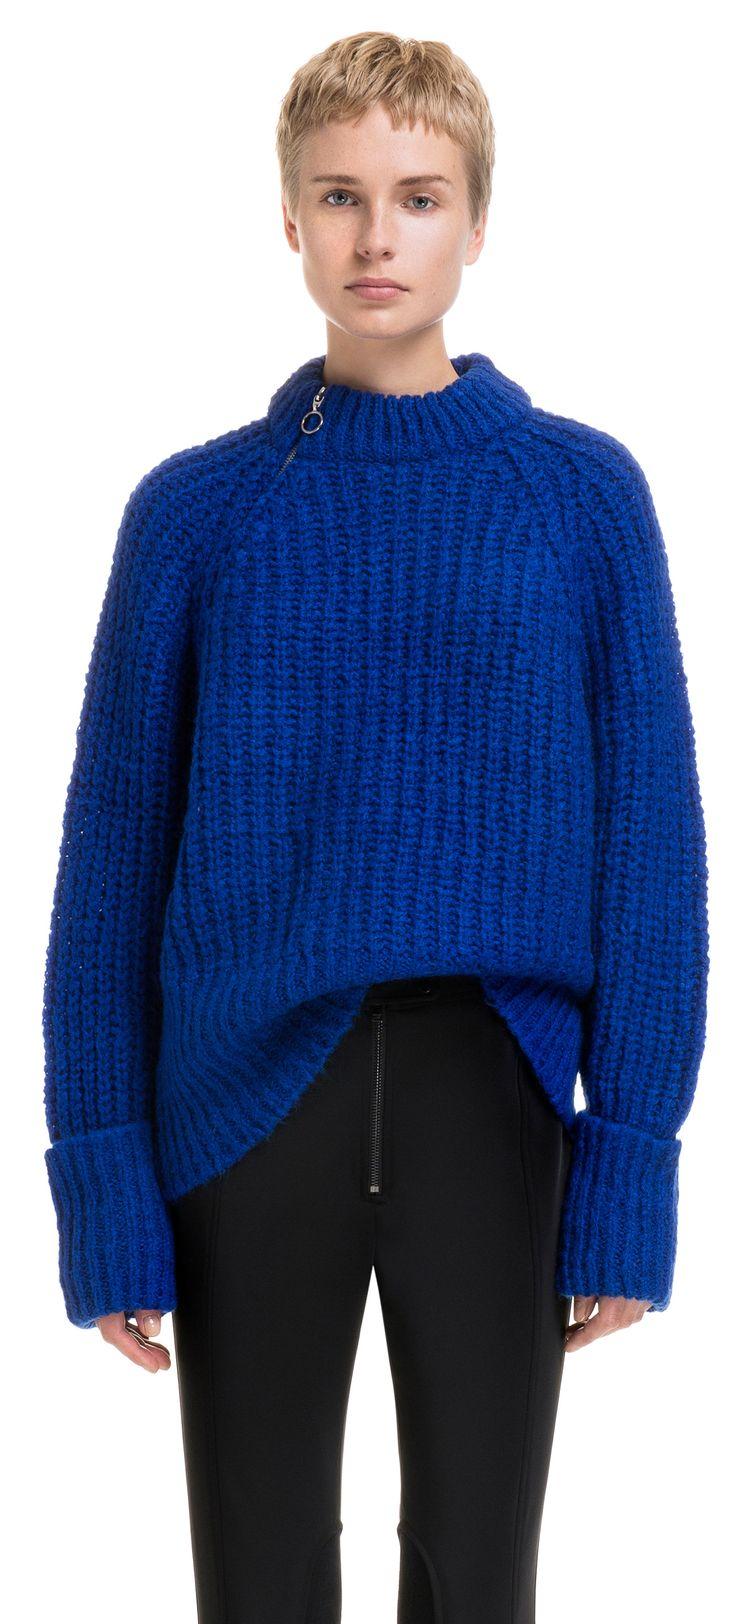 Jersey cremallera azul | BIMBA Y LOLA ®